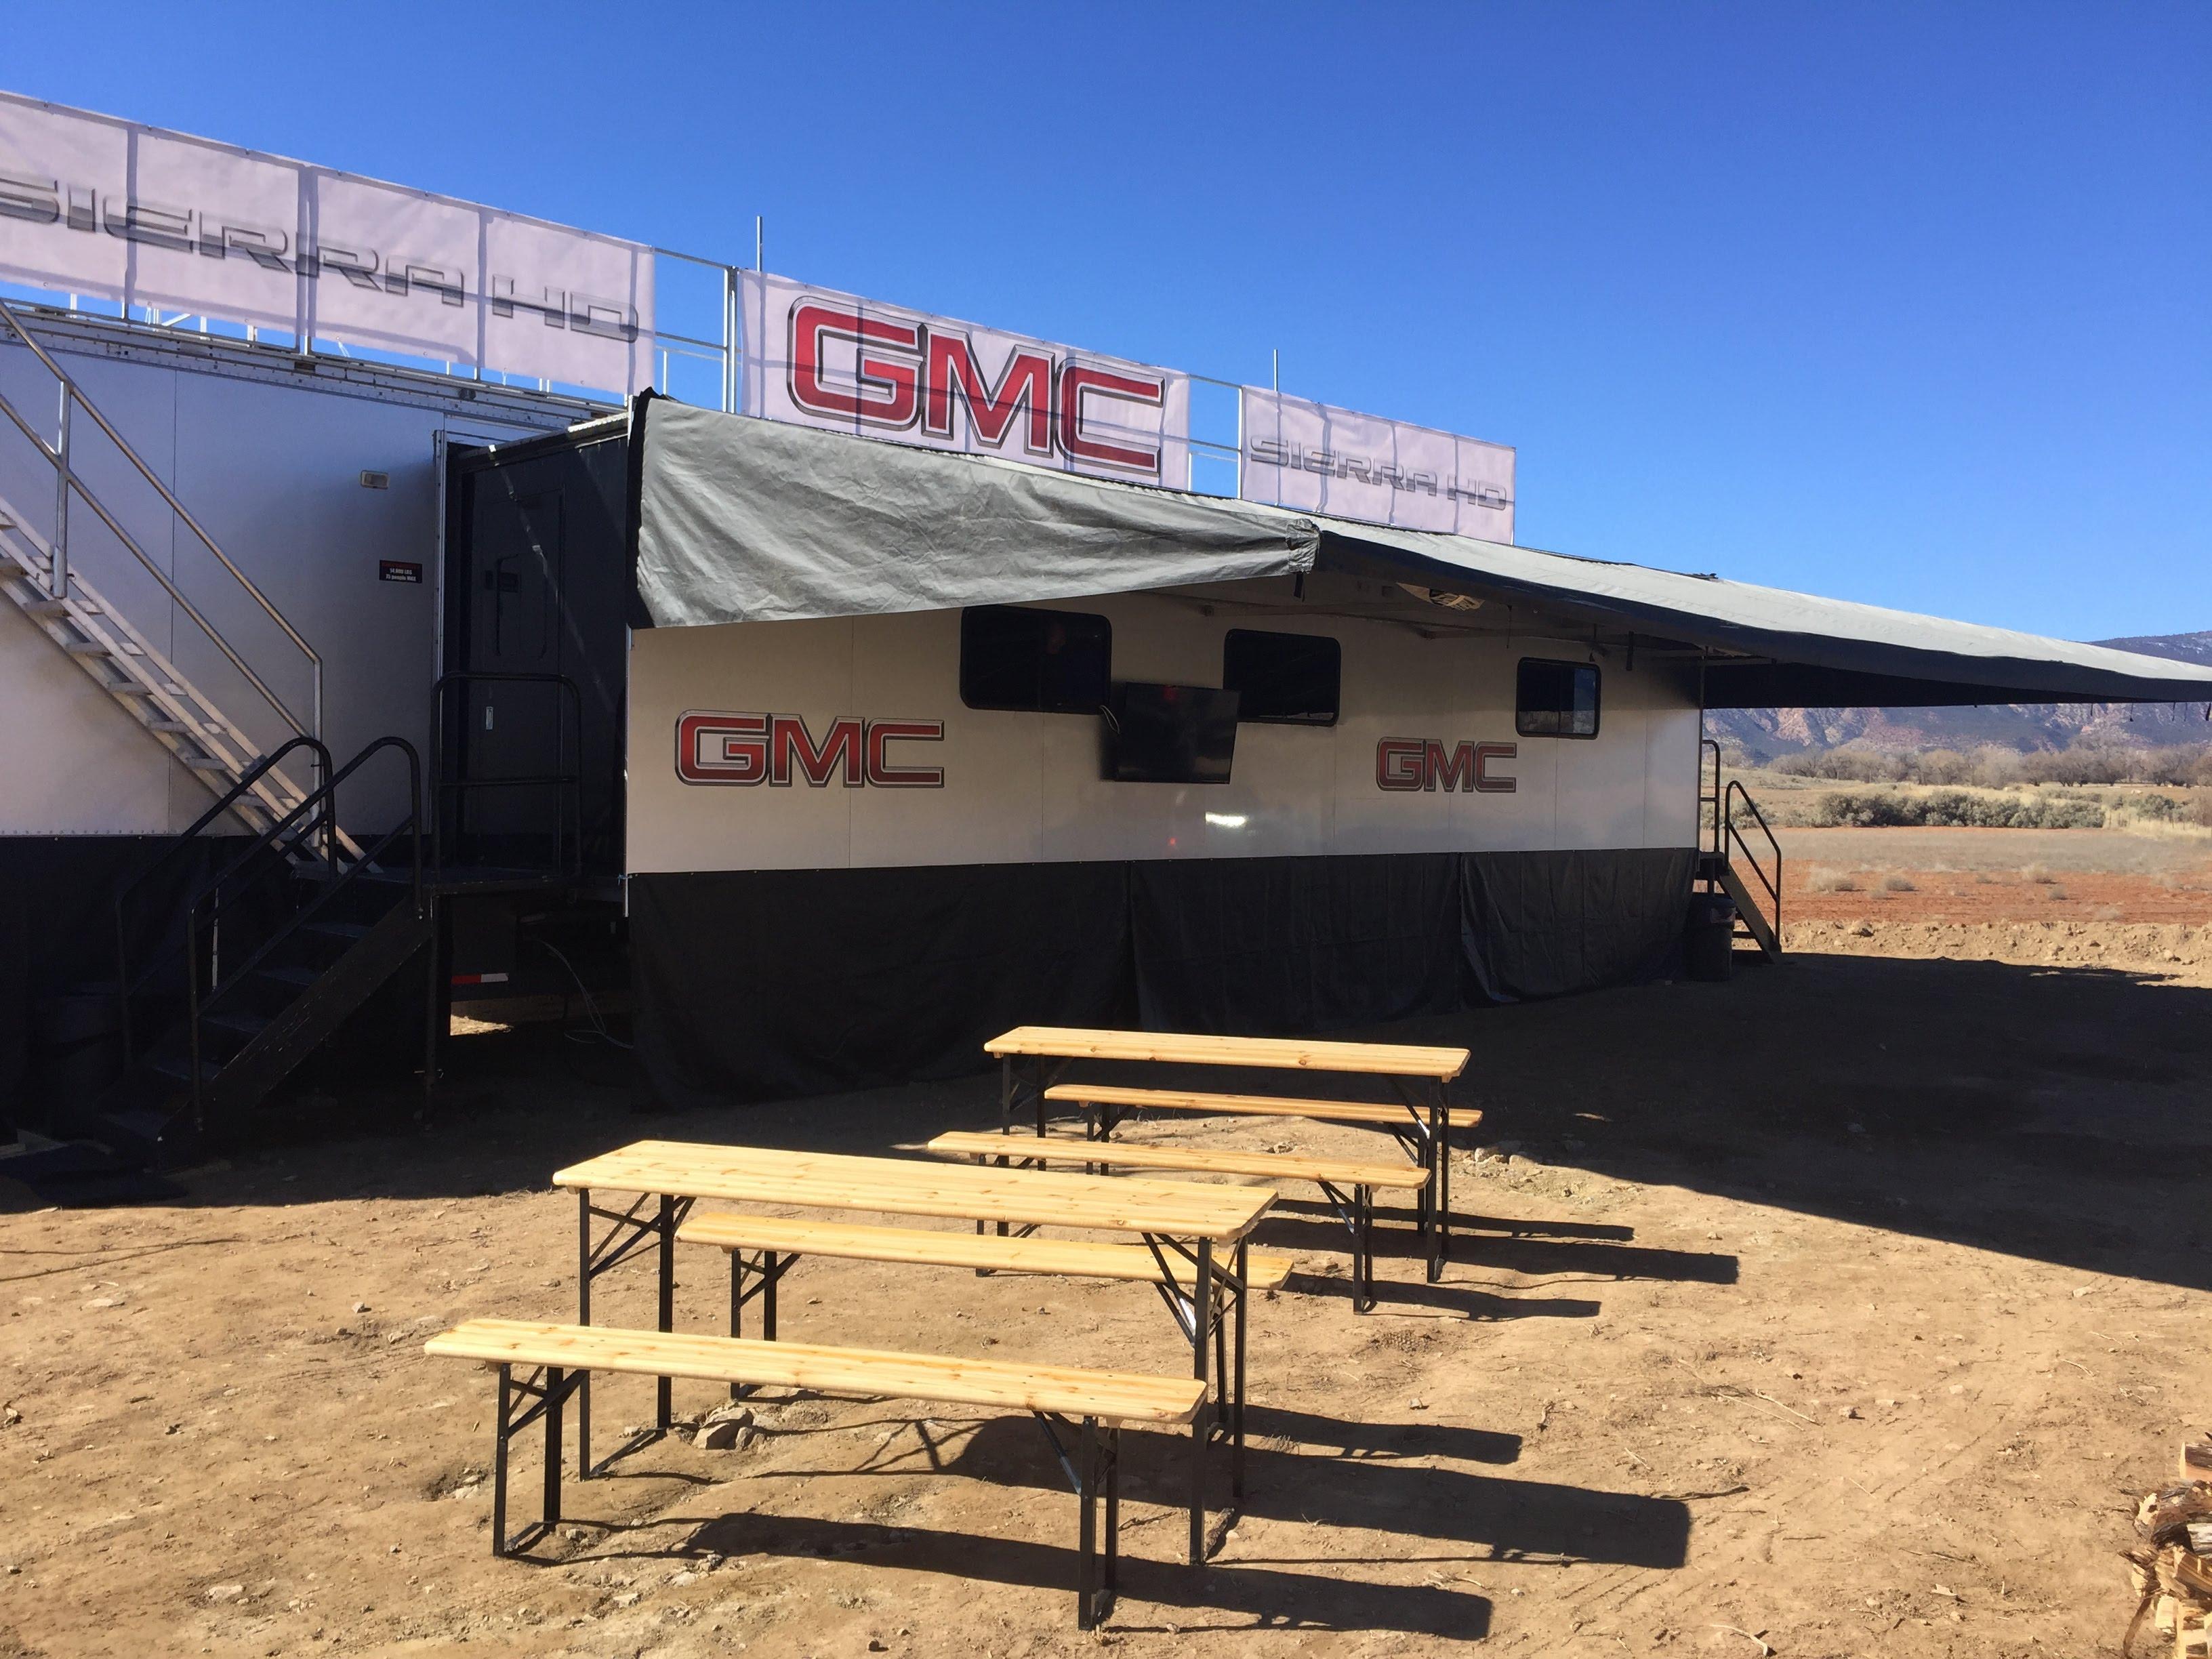 hospitality trailer awning setup at GMC event